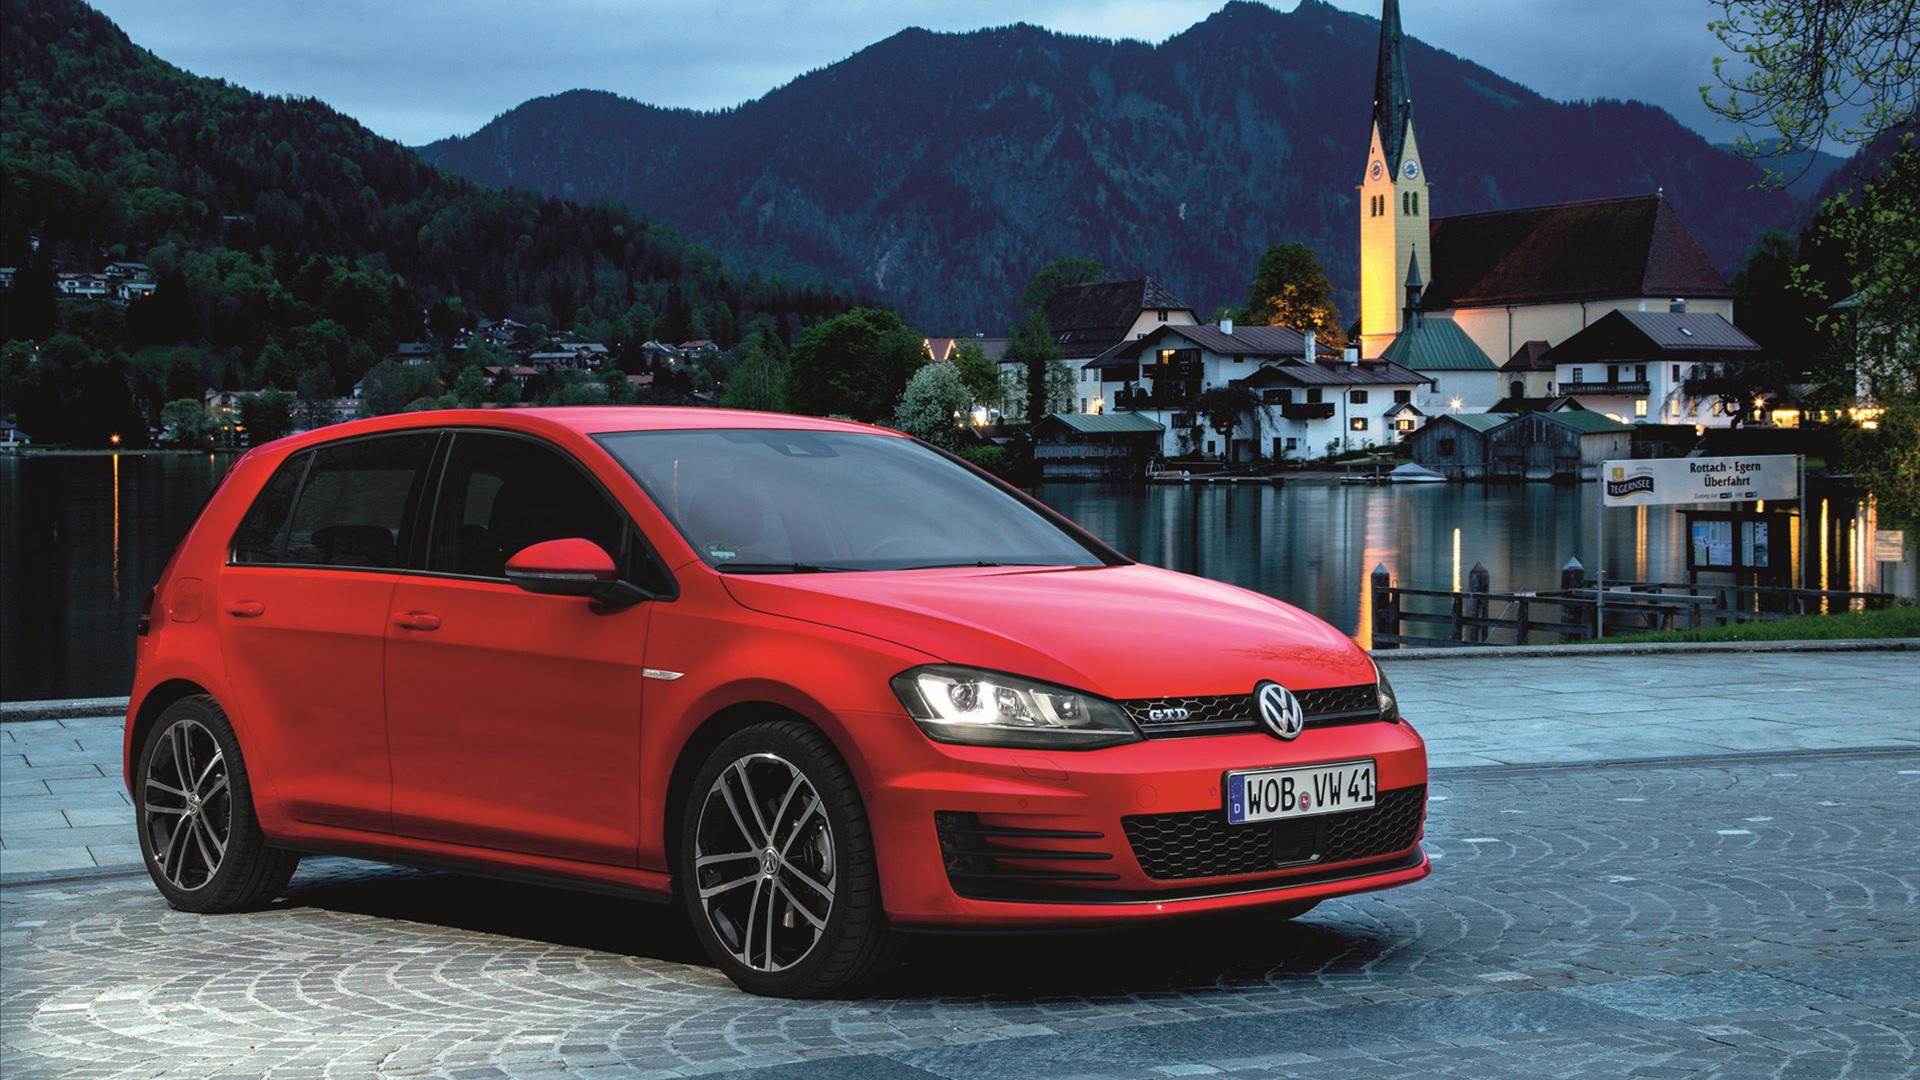 2014 Volkswagen Golf GTD Wallpaper HD Car Wallpapers 1920x1080